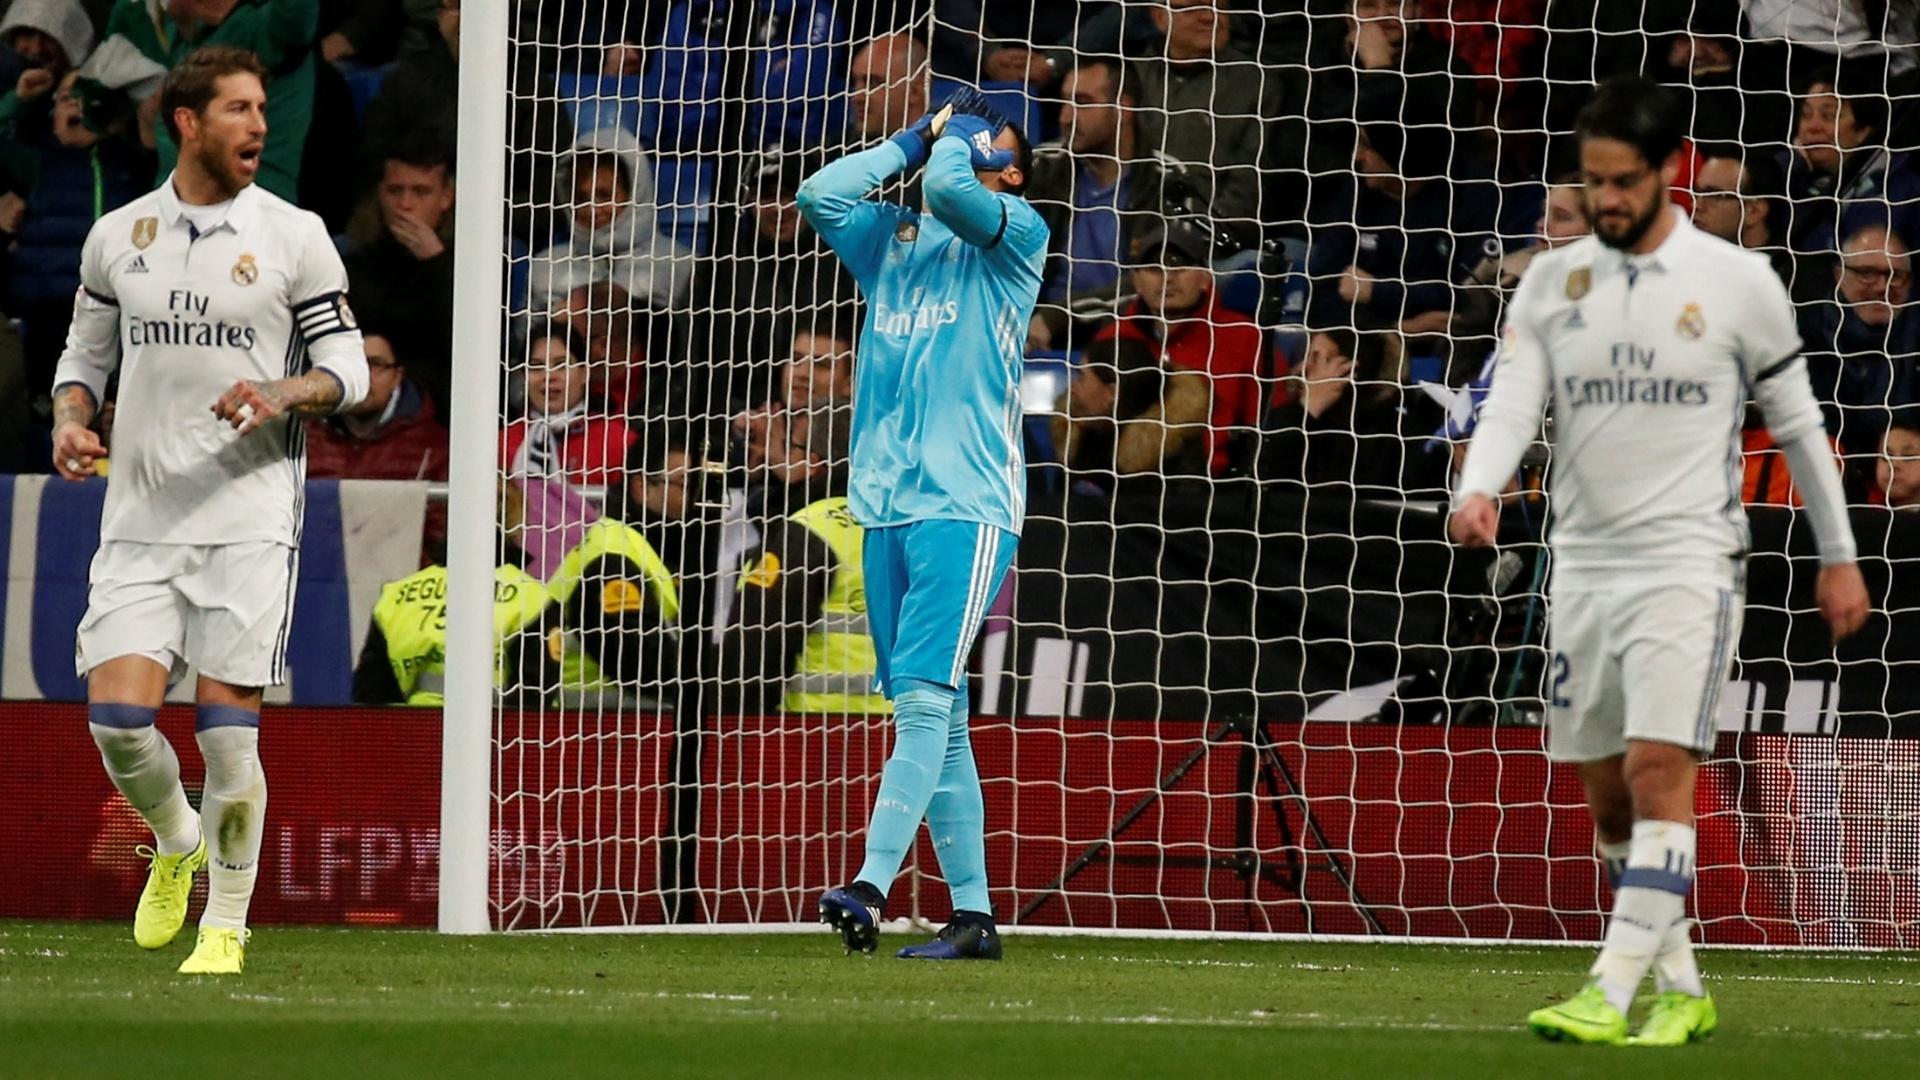 No Campeonato Espanhol, Keylor Navas lamenta gol do Betis